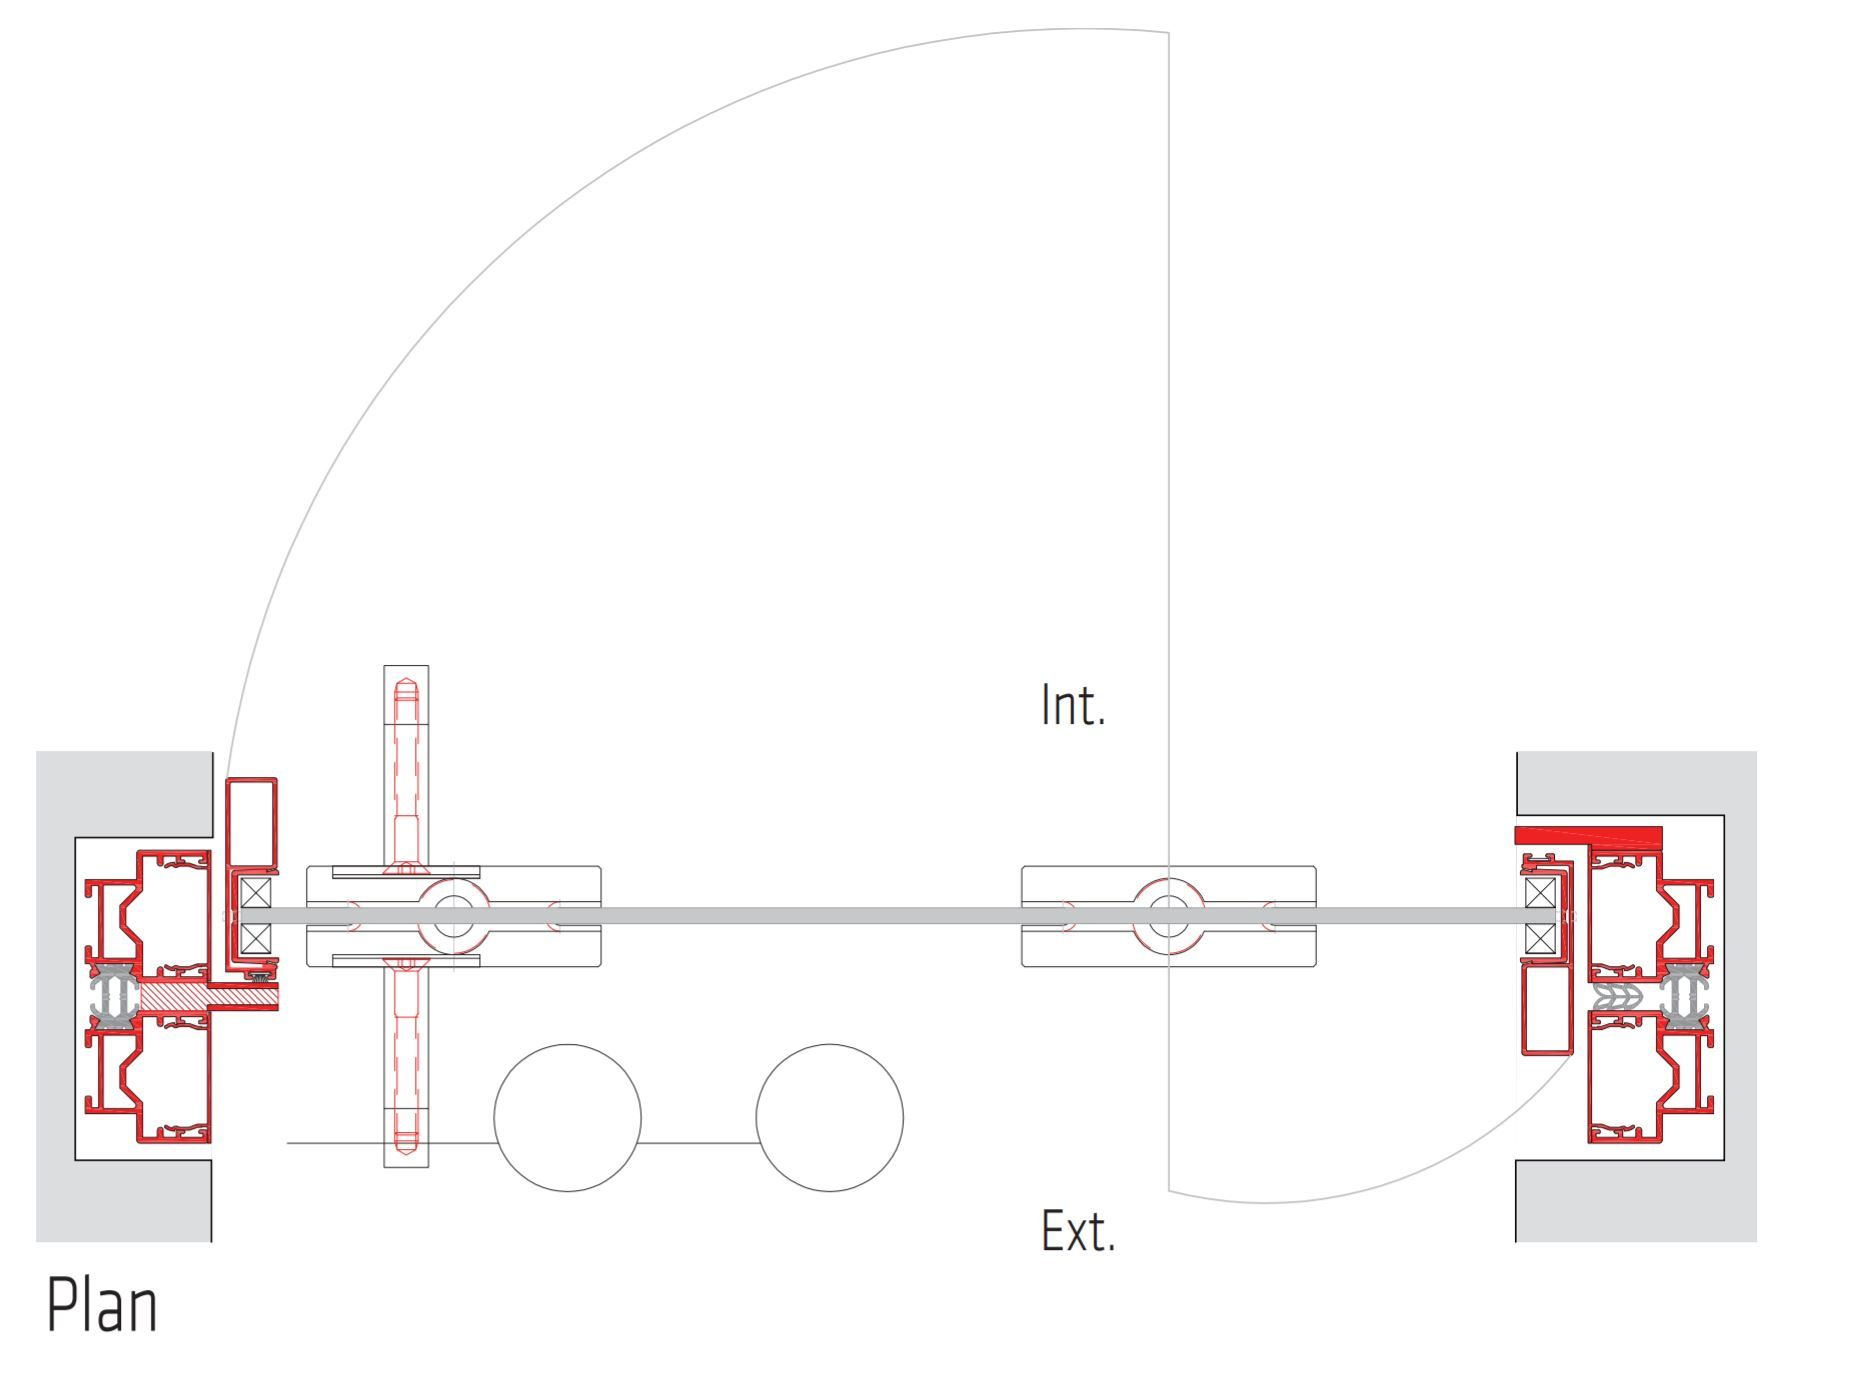 Pin By Mikey Mendiola On Design Pivot Doors Design Diagram